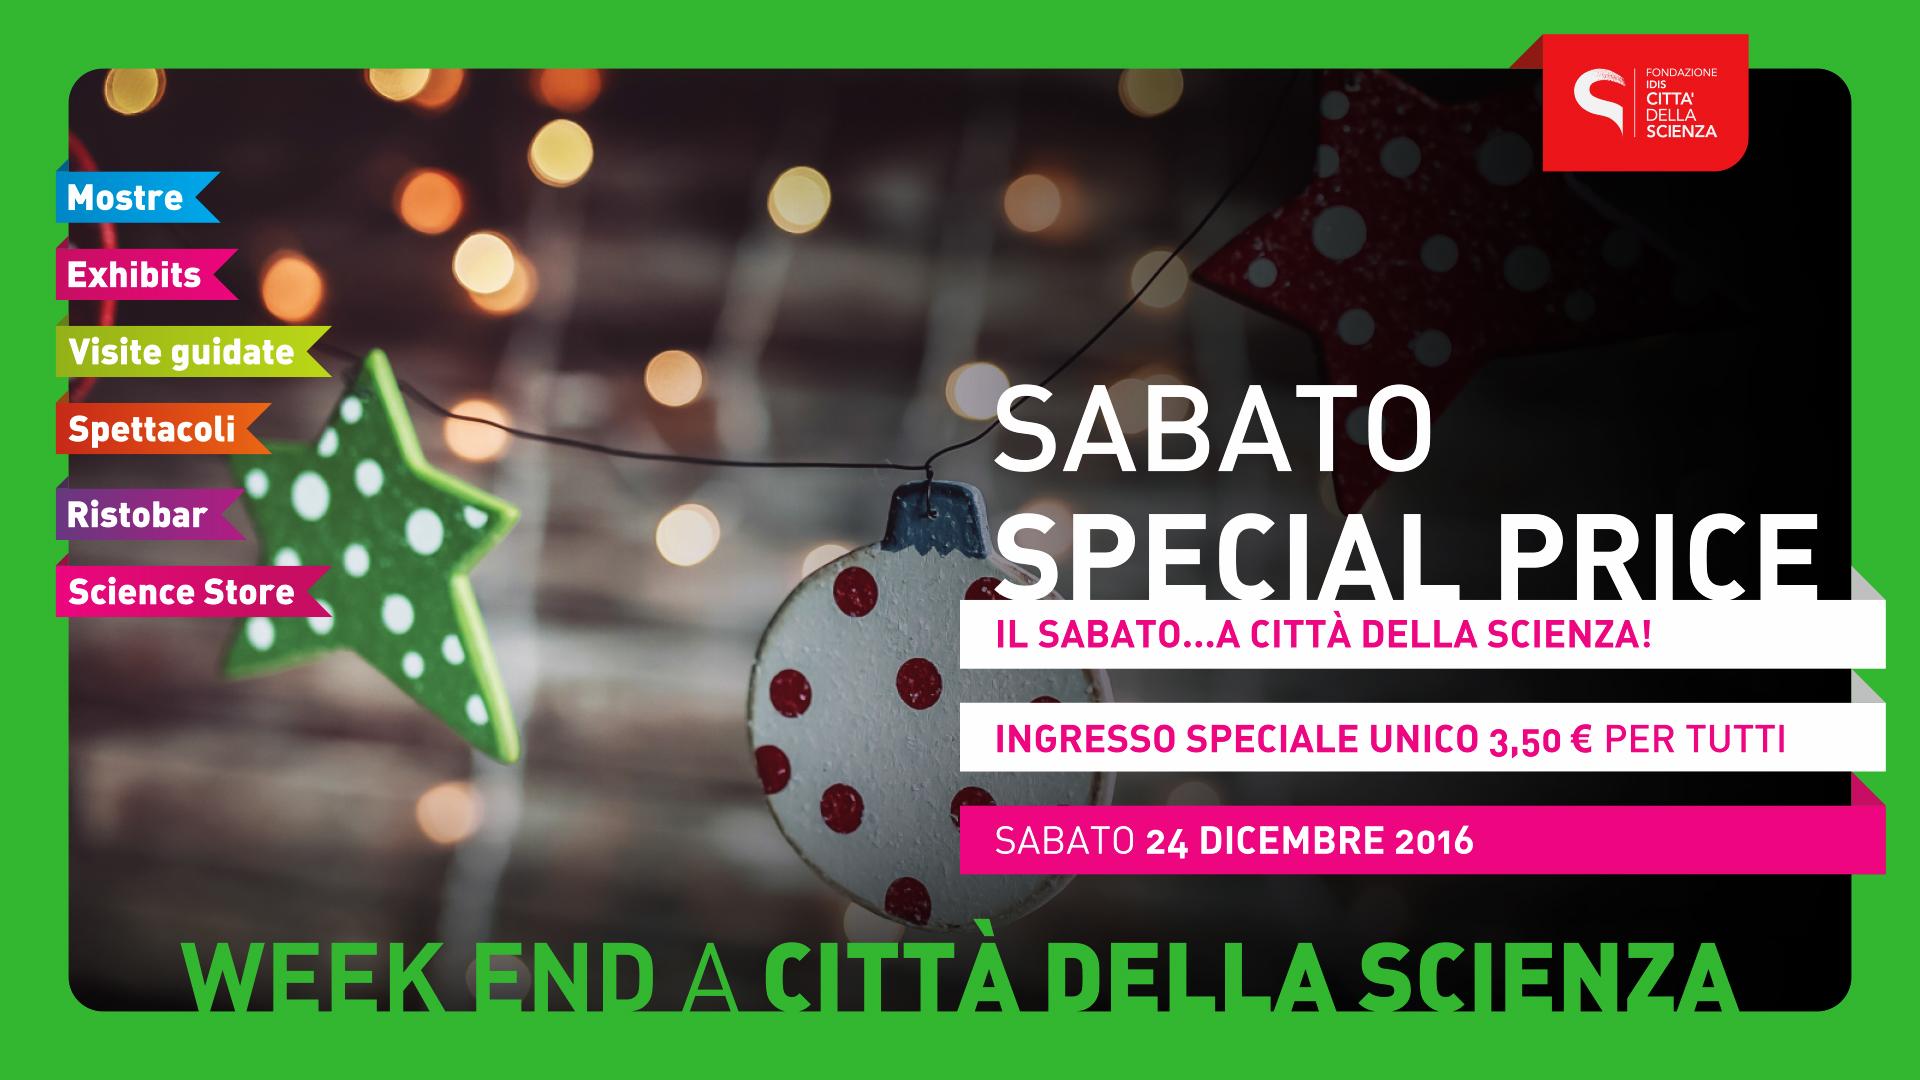 special price 24 dicembre